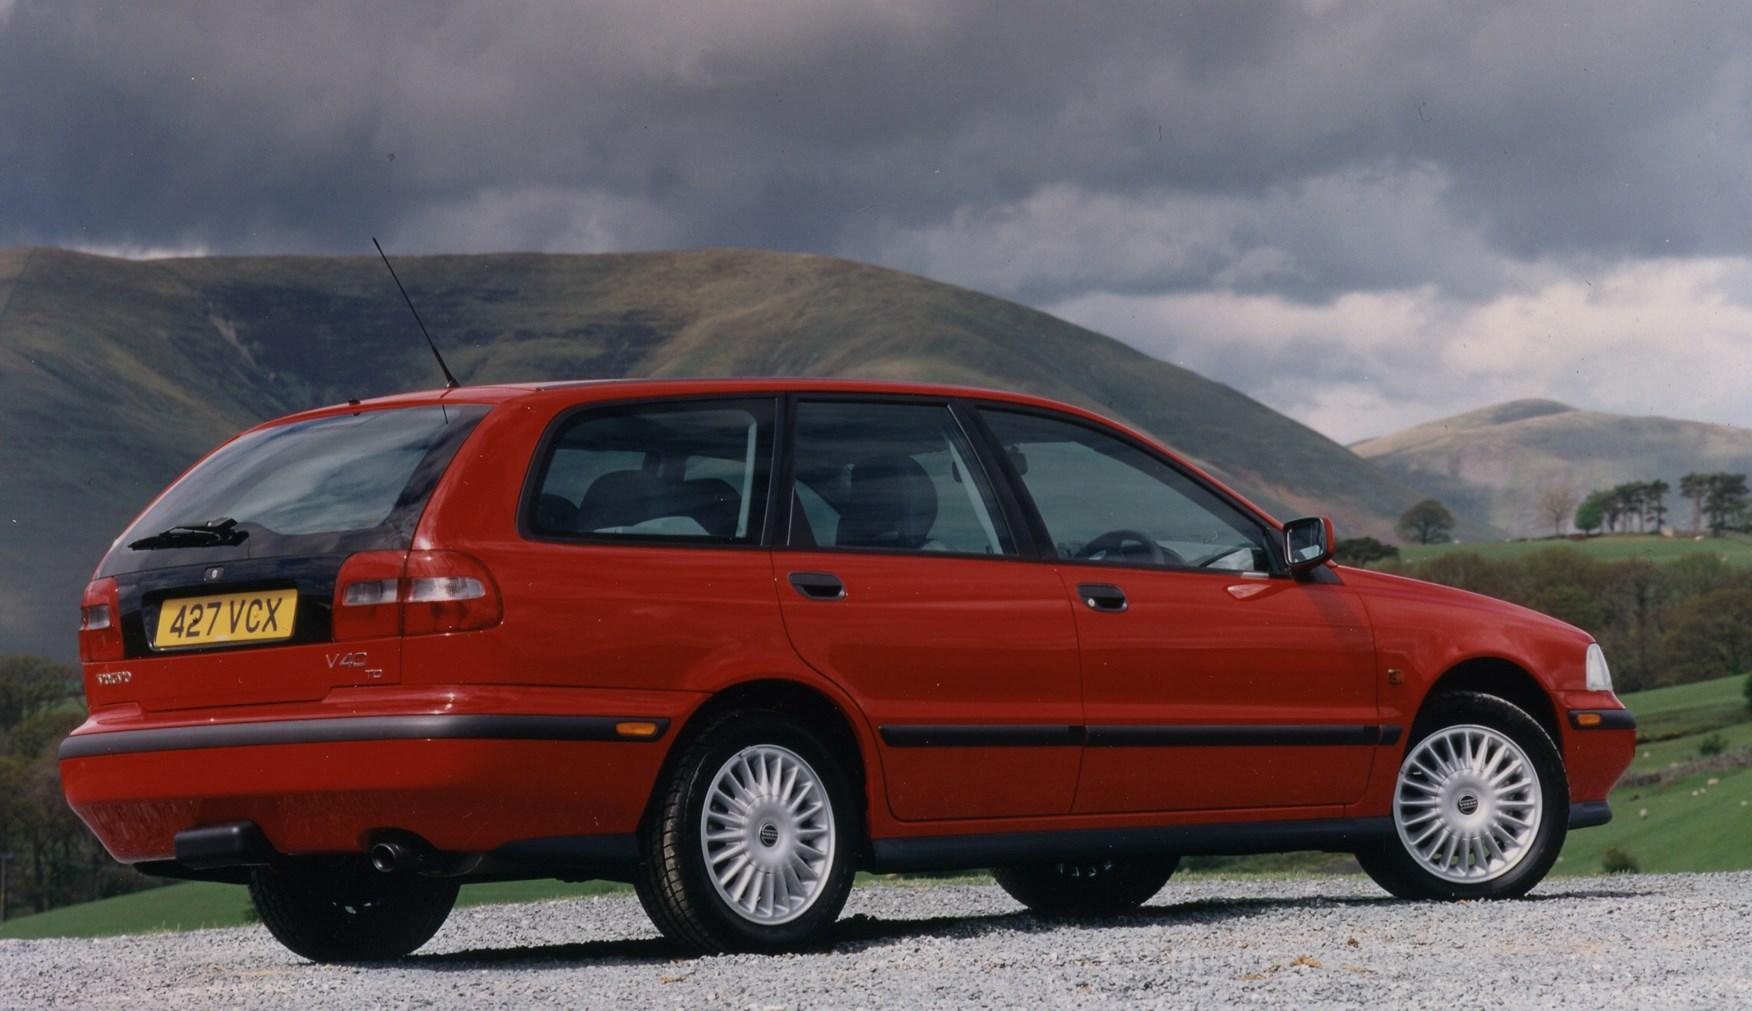 Volvo V40 Estate Review 1996 2004 Parkers V4 0 Wagon